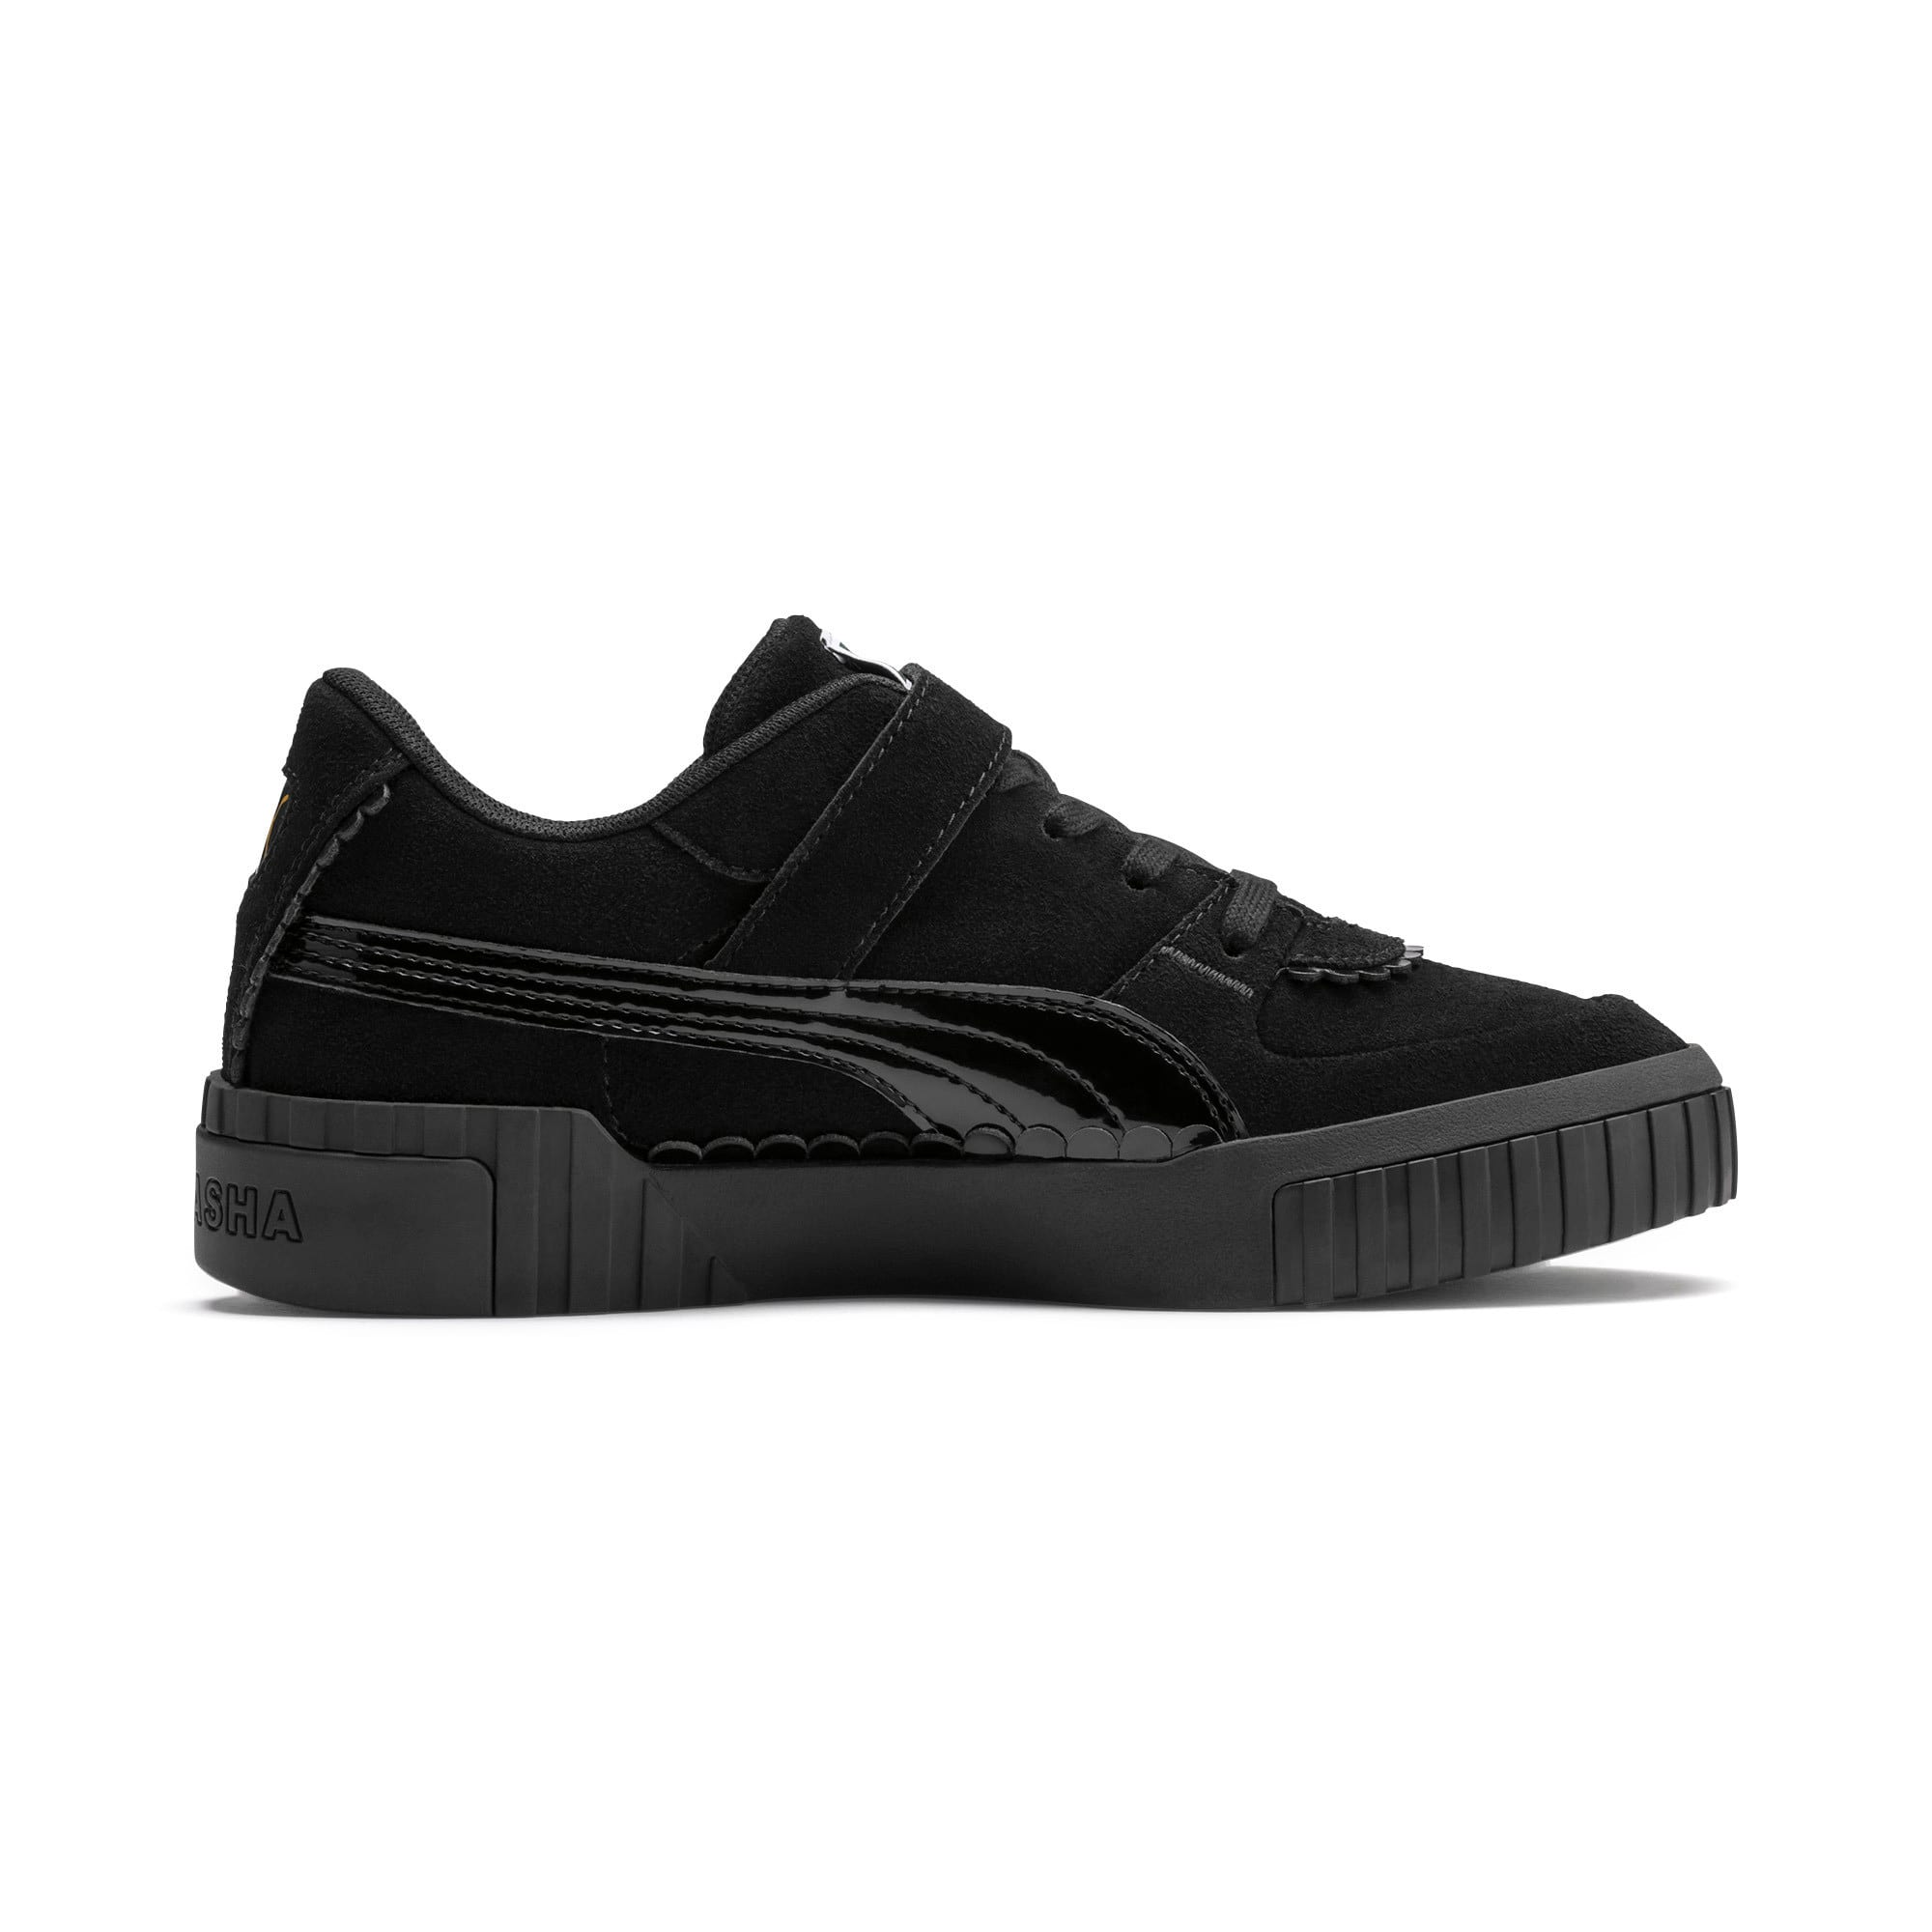 Thumbnail 6 of PUMA x TYAKASHA Cali Women's Sneakers, Puma Black, medium